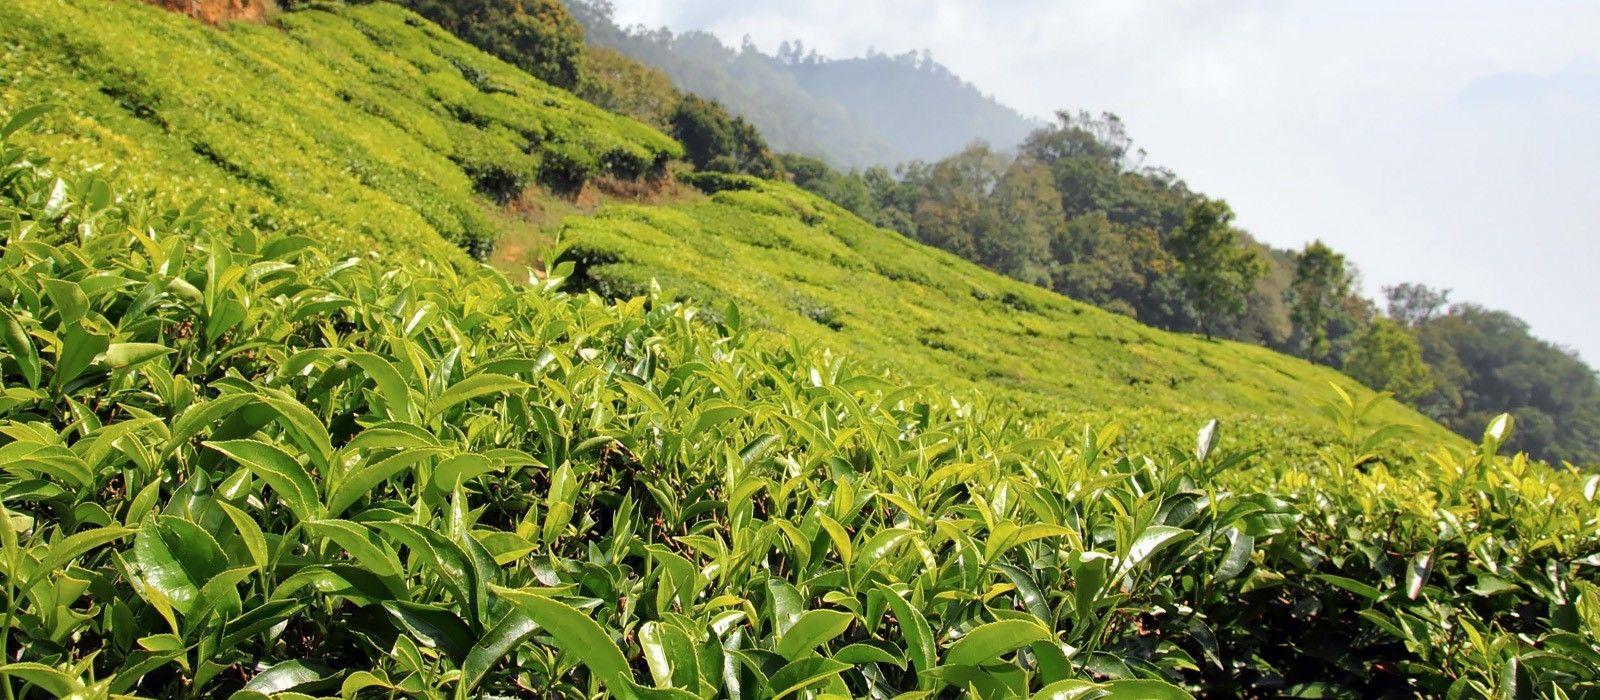 Darjeeling: Teegenuss & Berge Urlaub 3